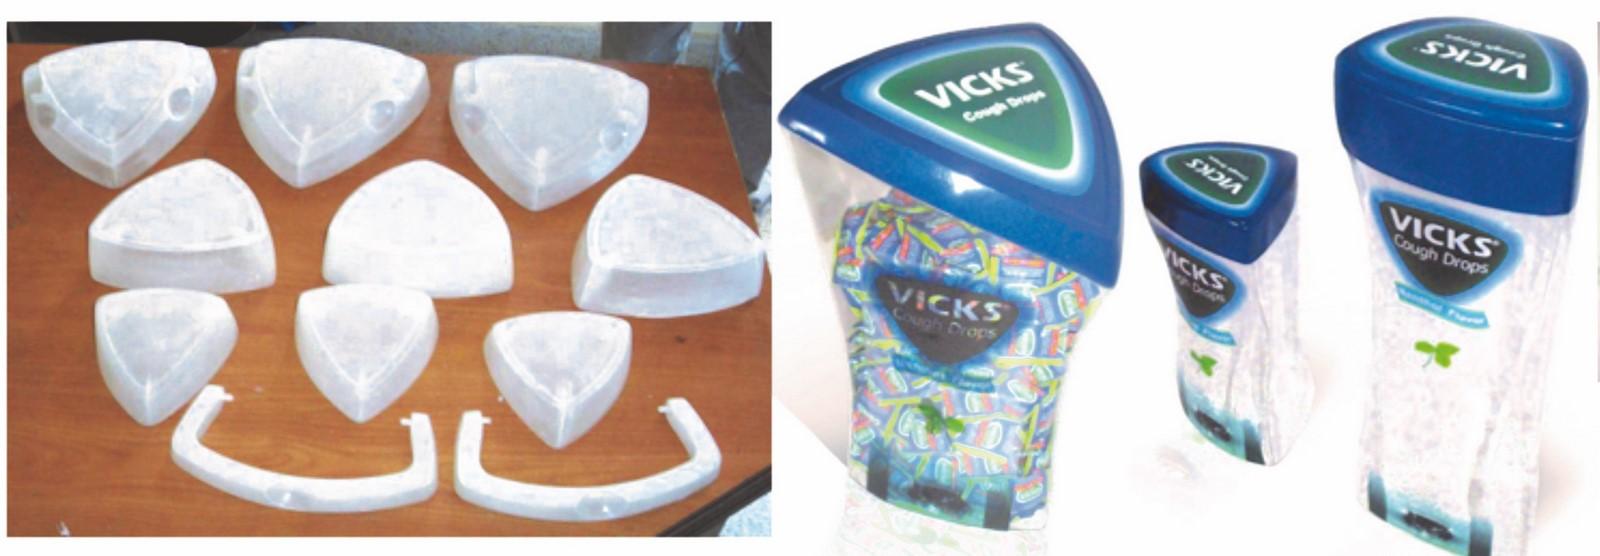 Vicks - Cough Jar Dispenser - Sheet3